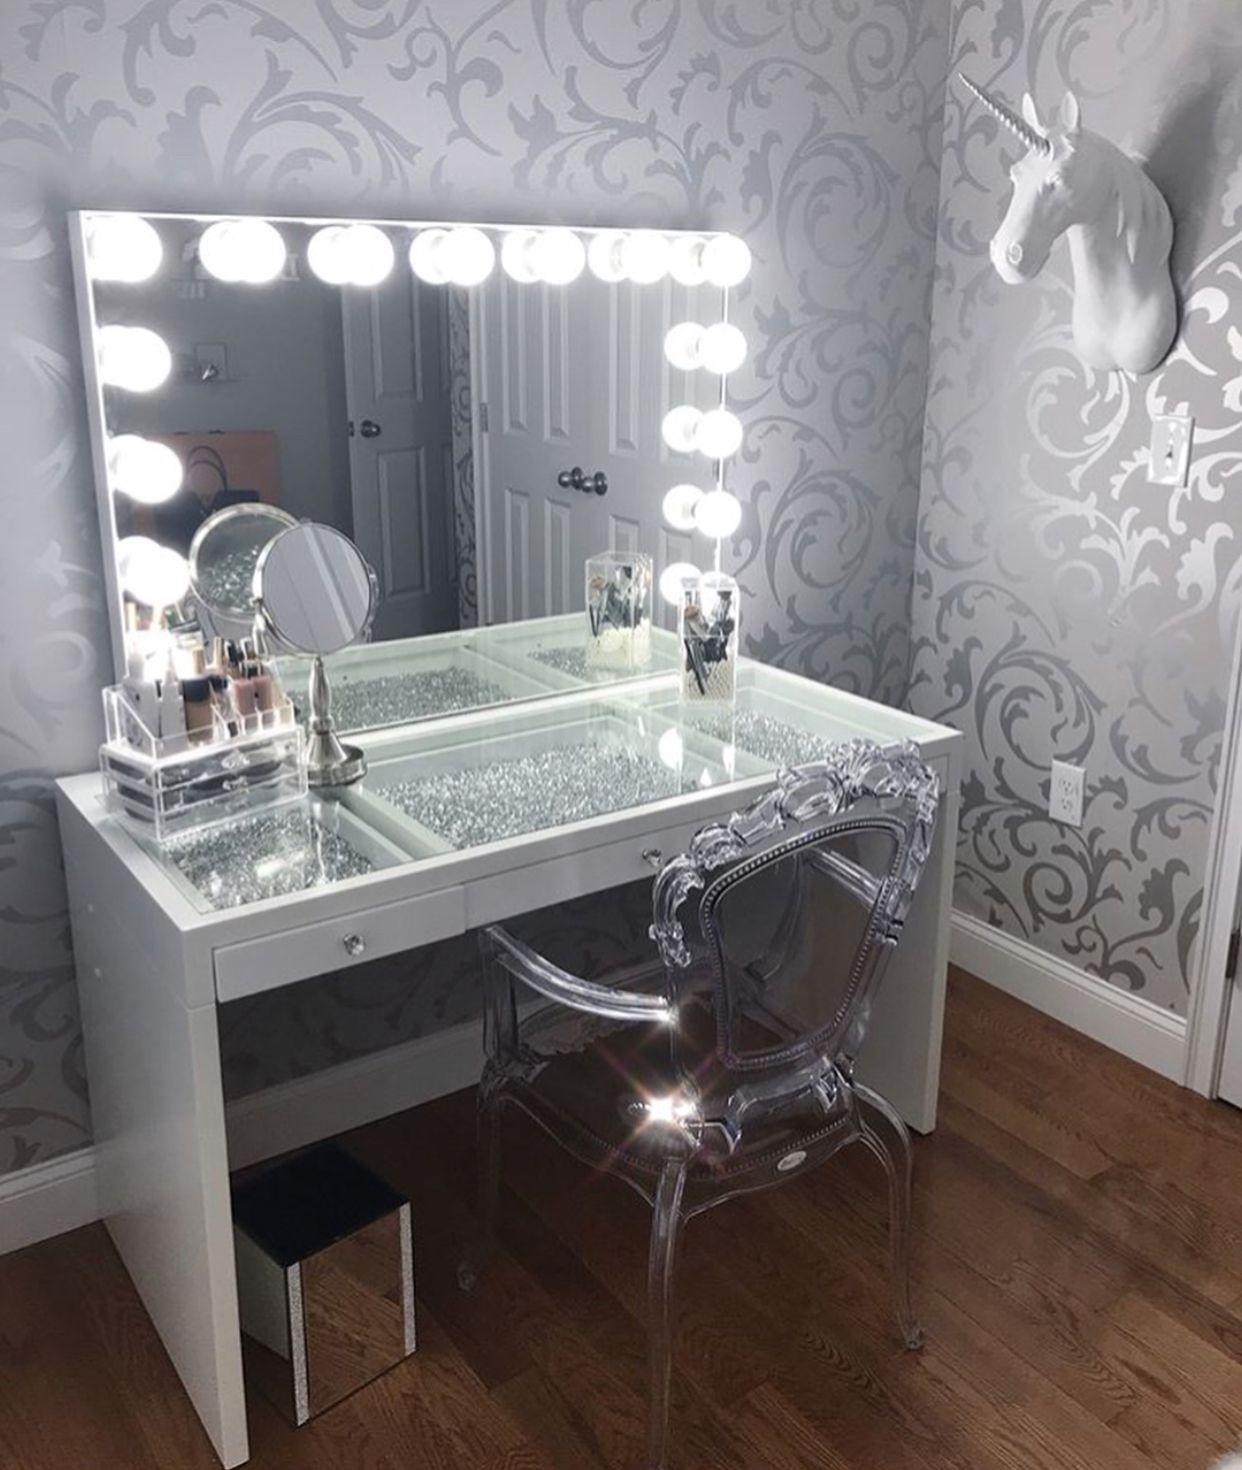 Wallpaper | Schlafzimmer design, Beauty-raum, Haus deko